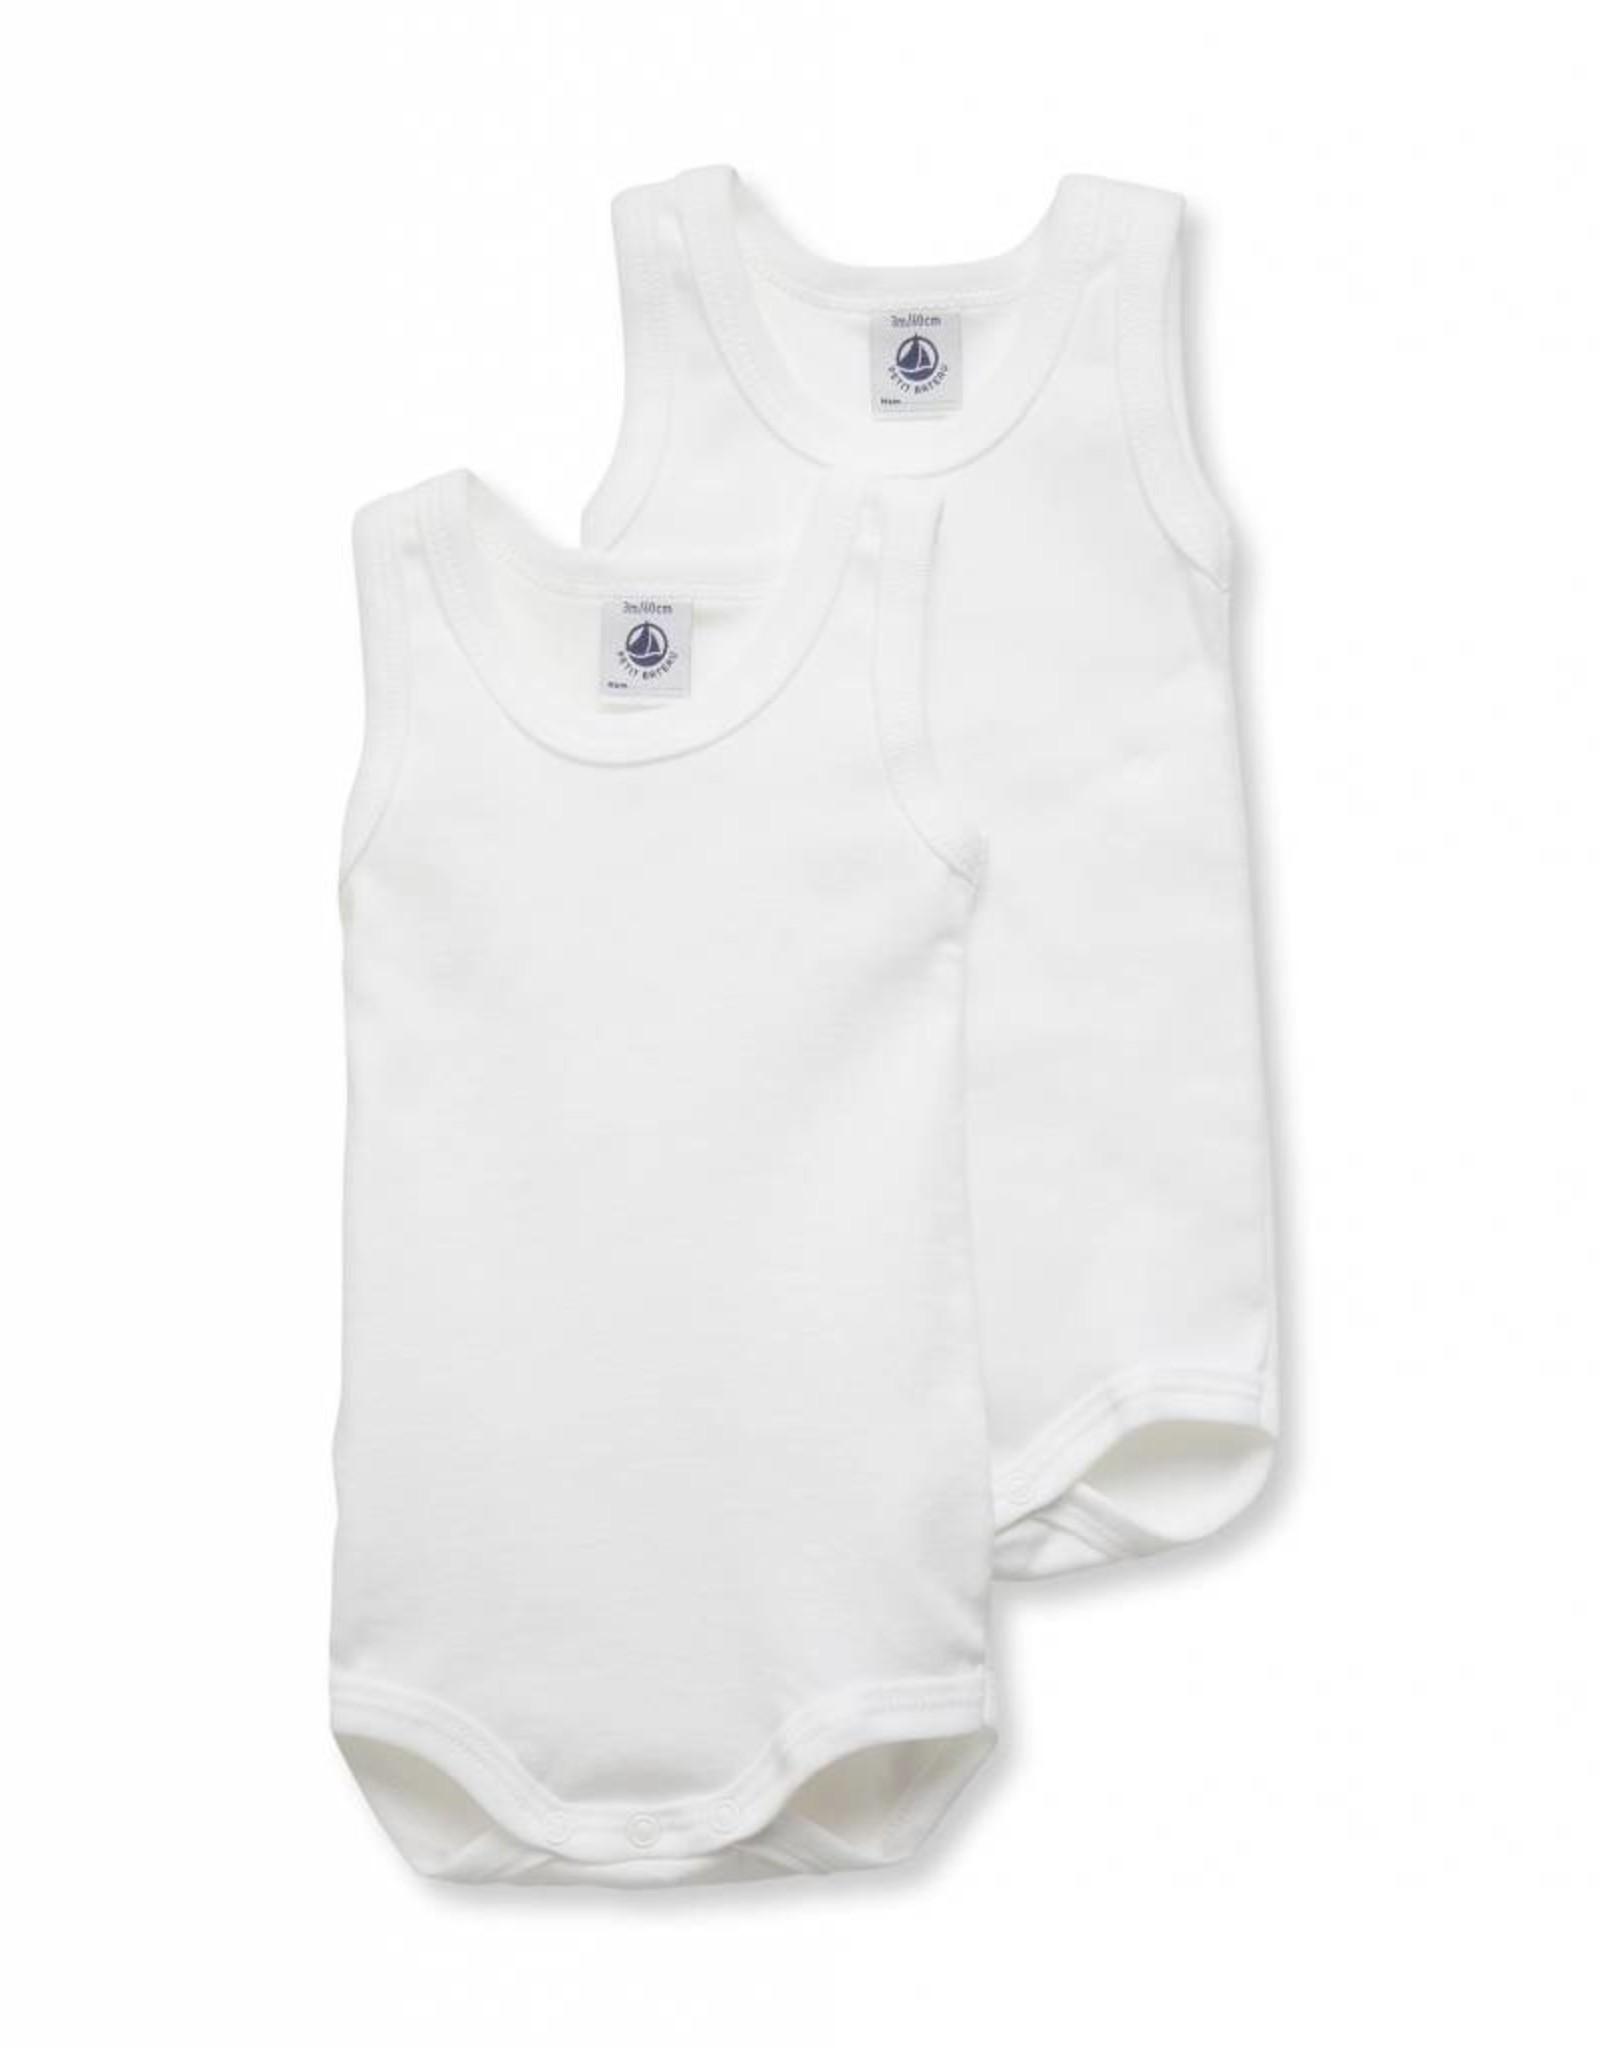 Set of 2 baby bodysuit